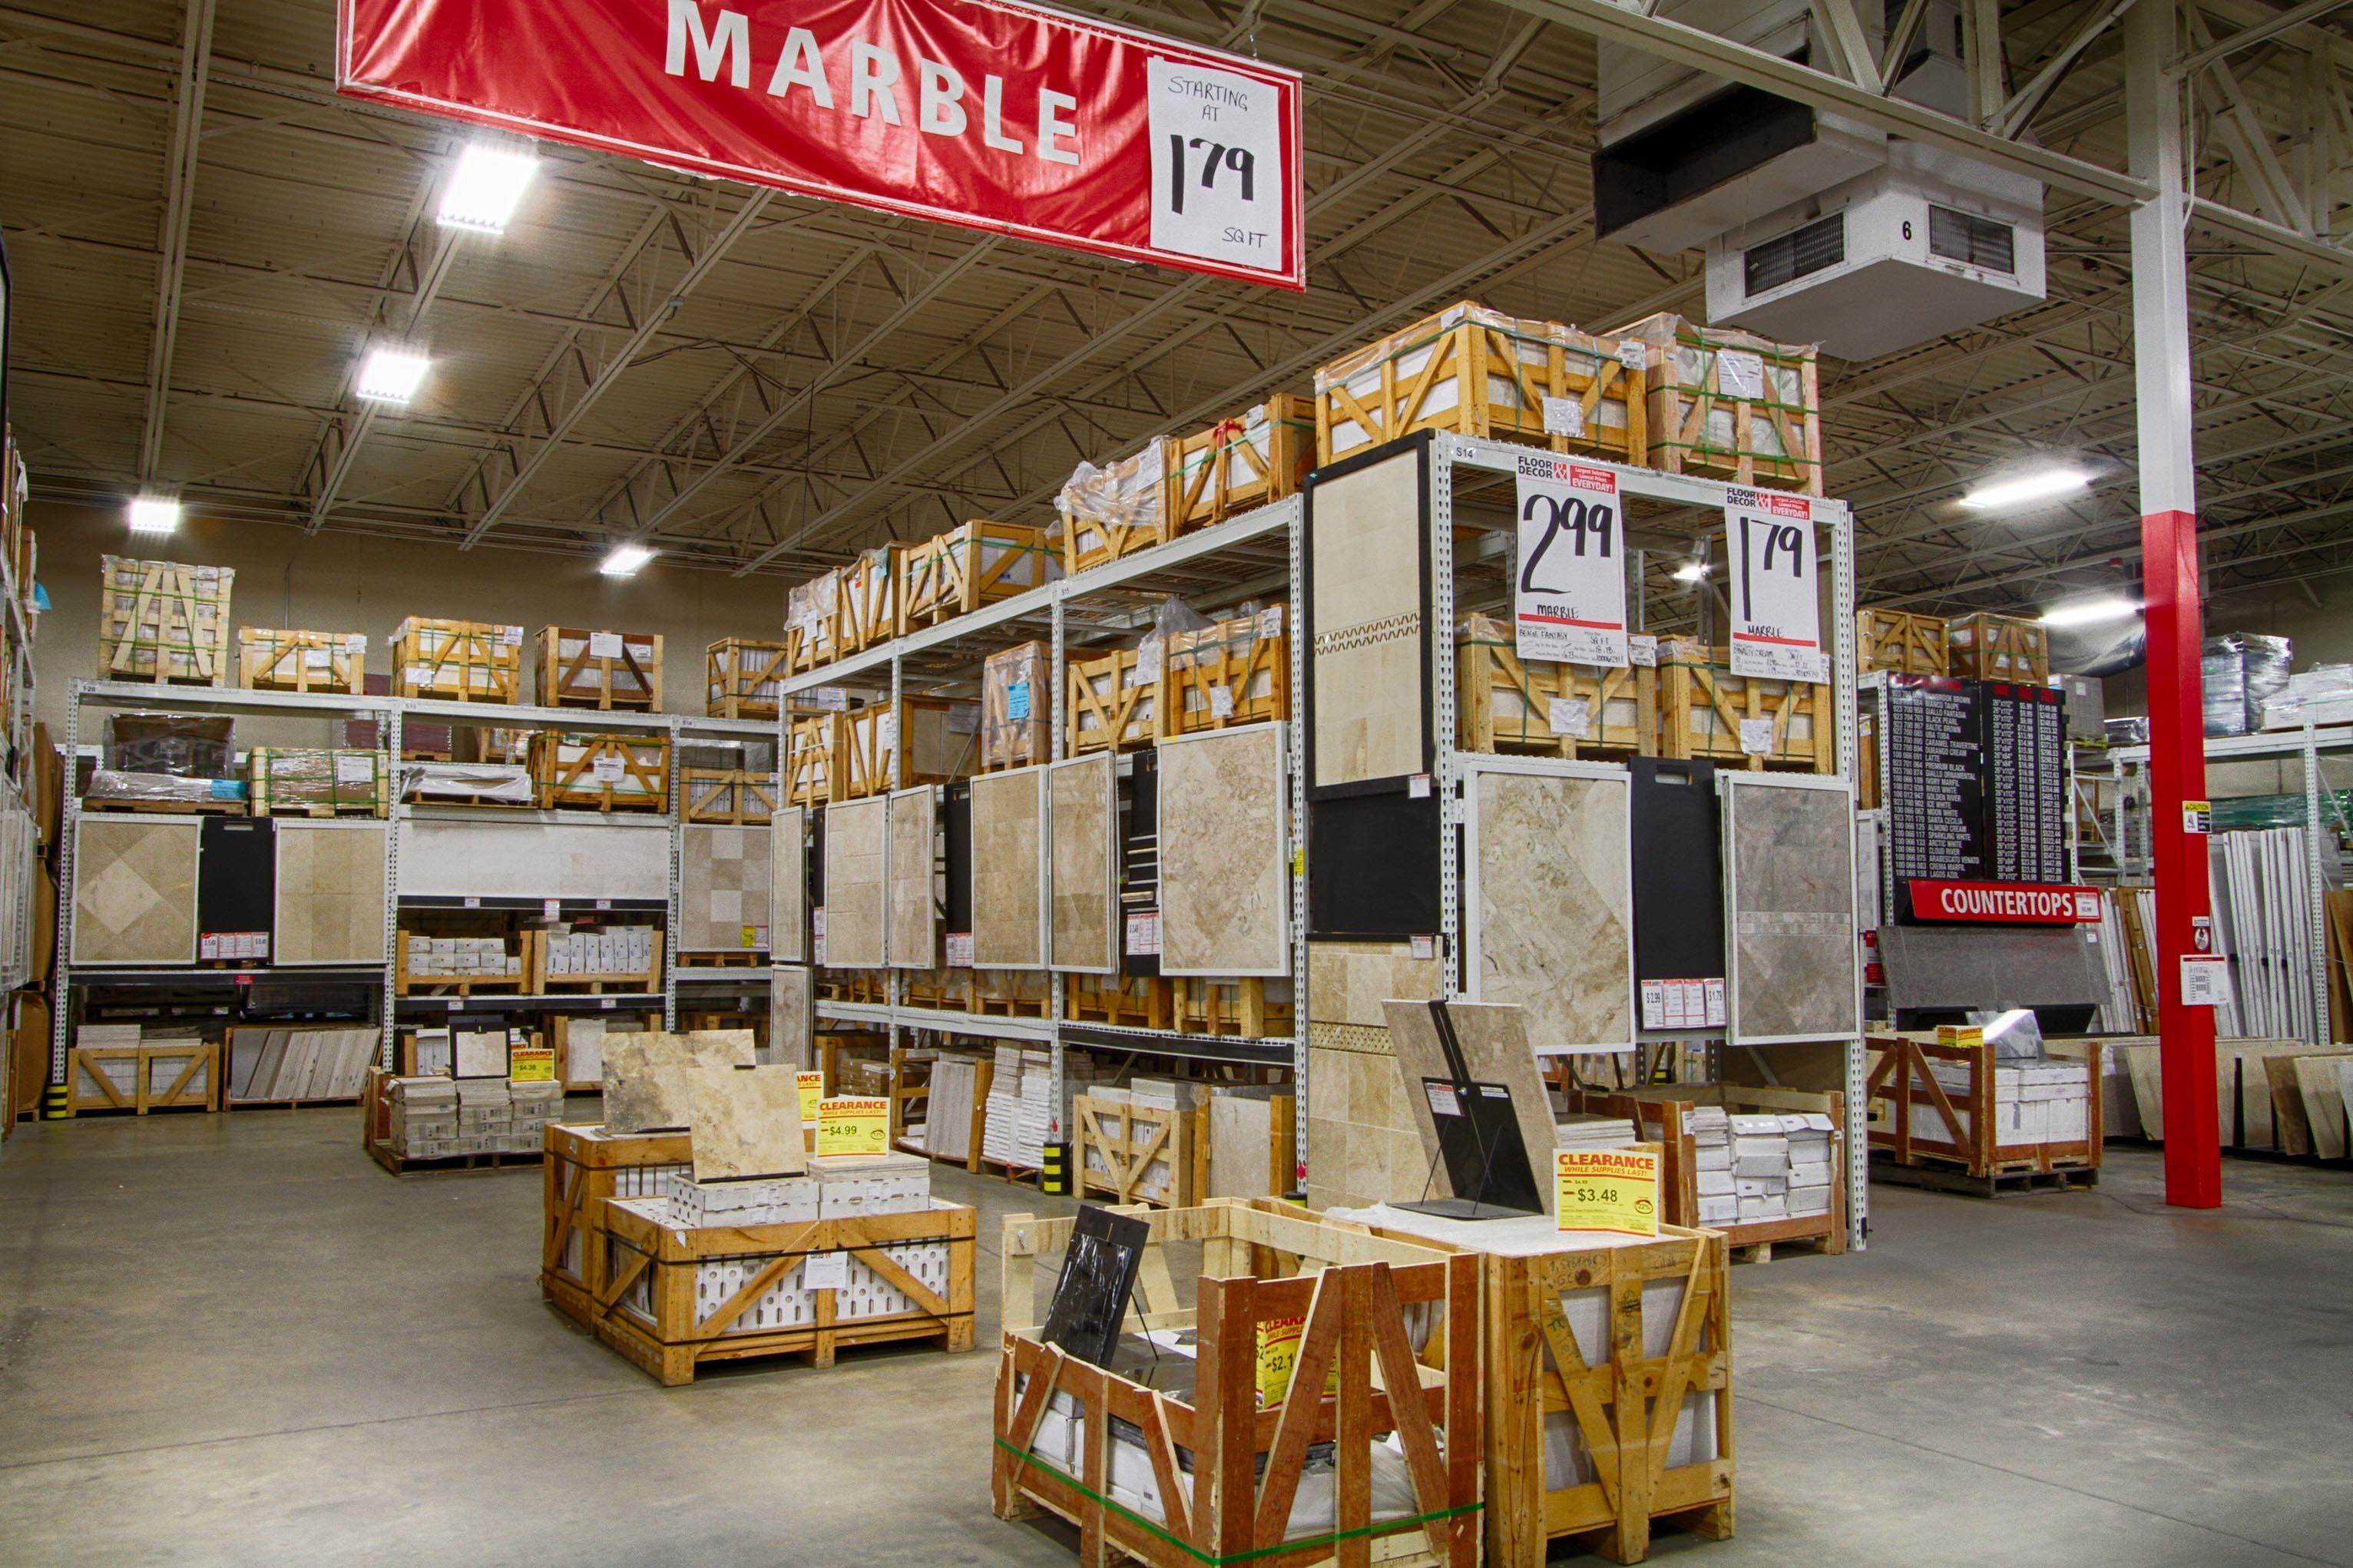 Floor Decor In Tampa Fl 33619